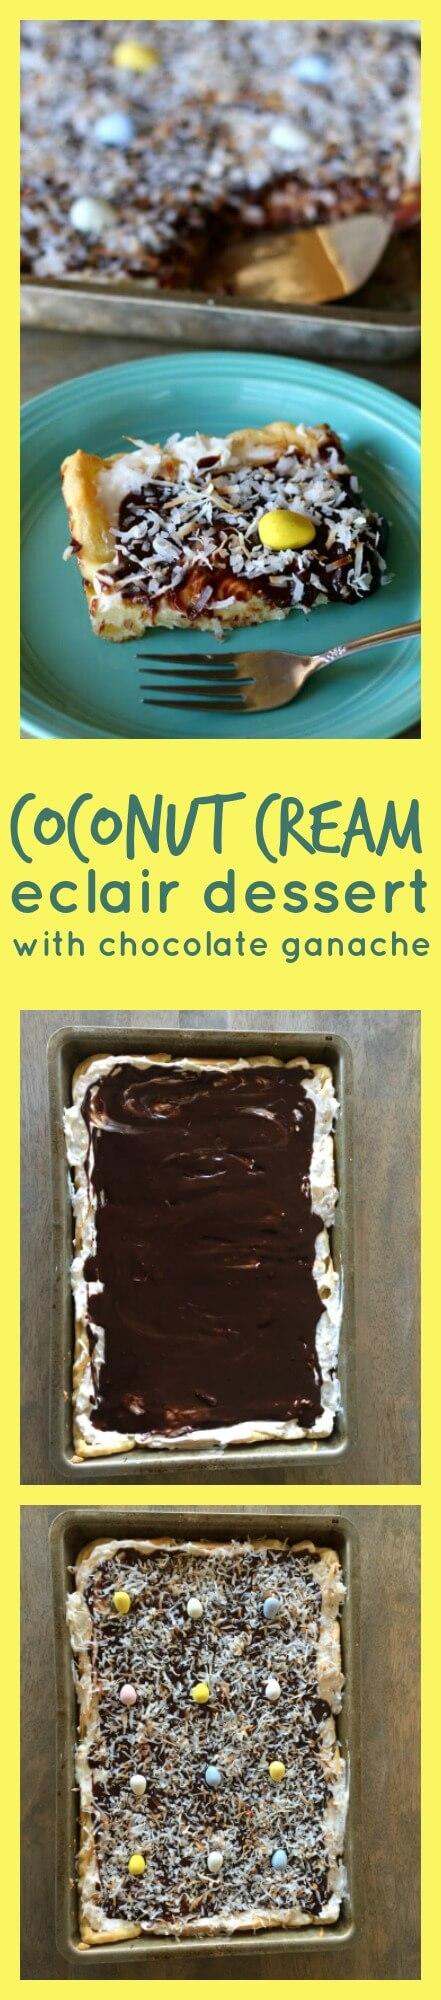 Coconut Cream Eclair Dessert with Chocolate Ganache